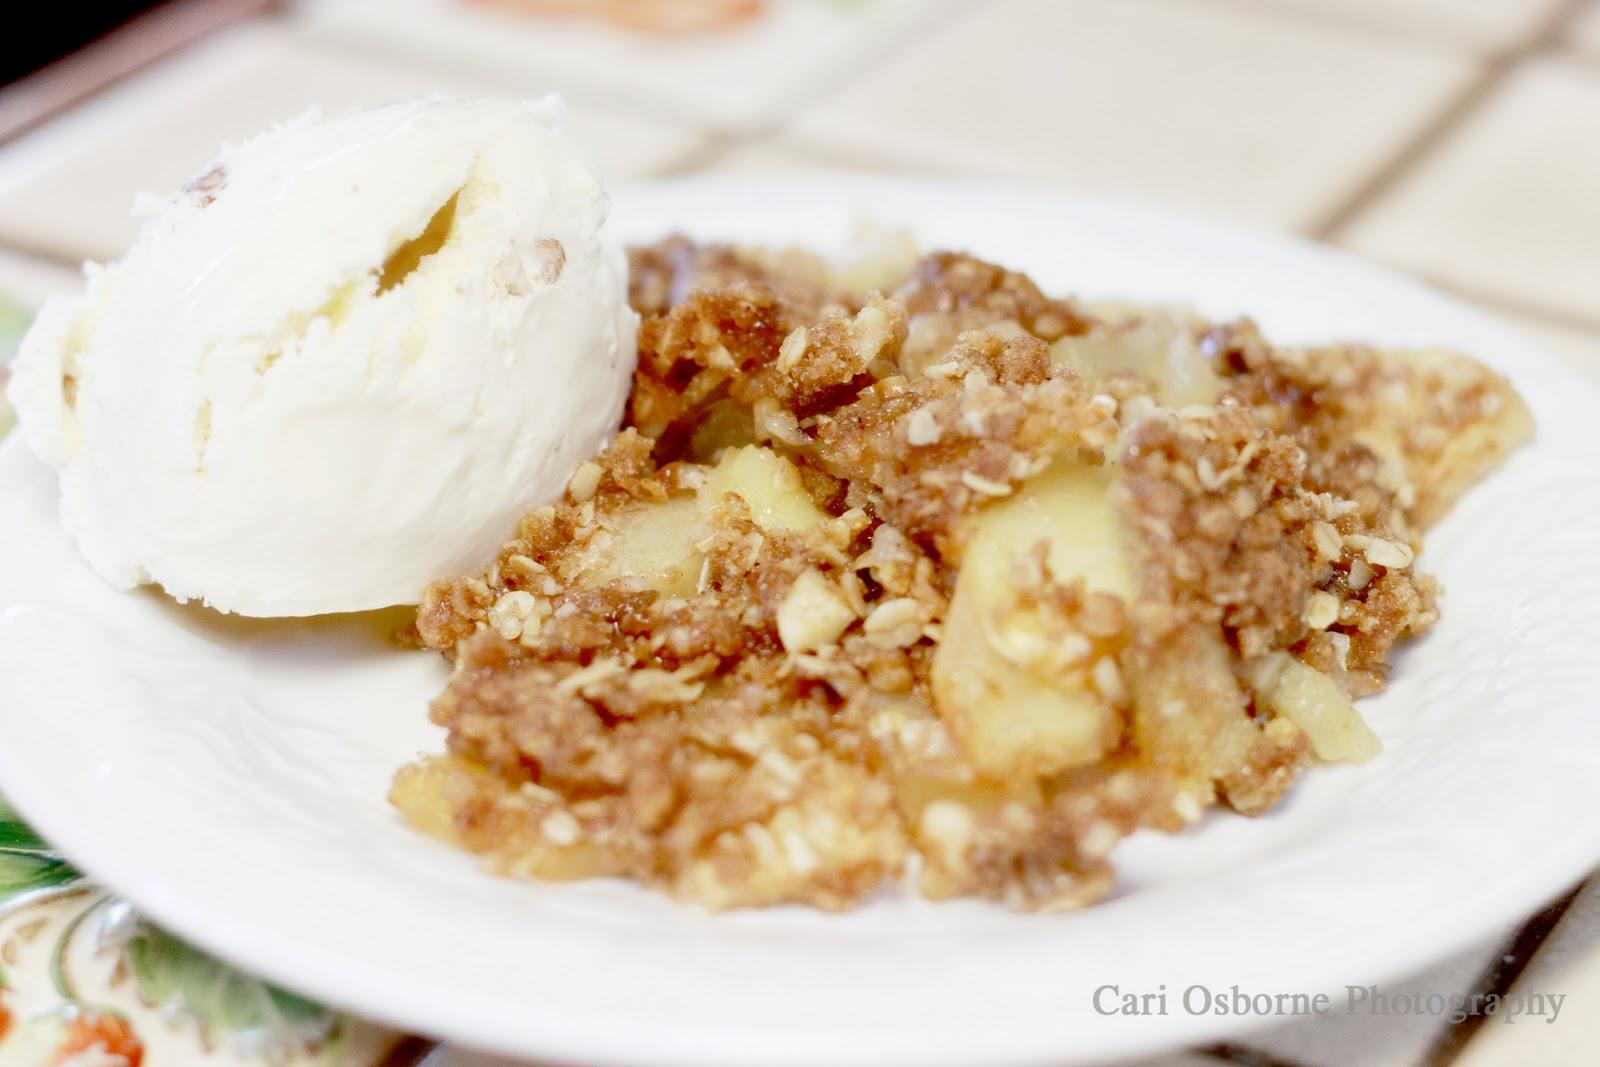 Serve warm with vanilla ice cream or caramel sauce, Enjoy!